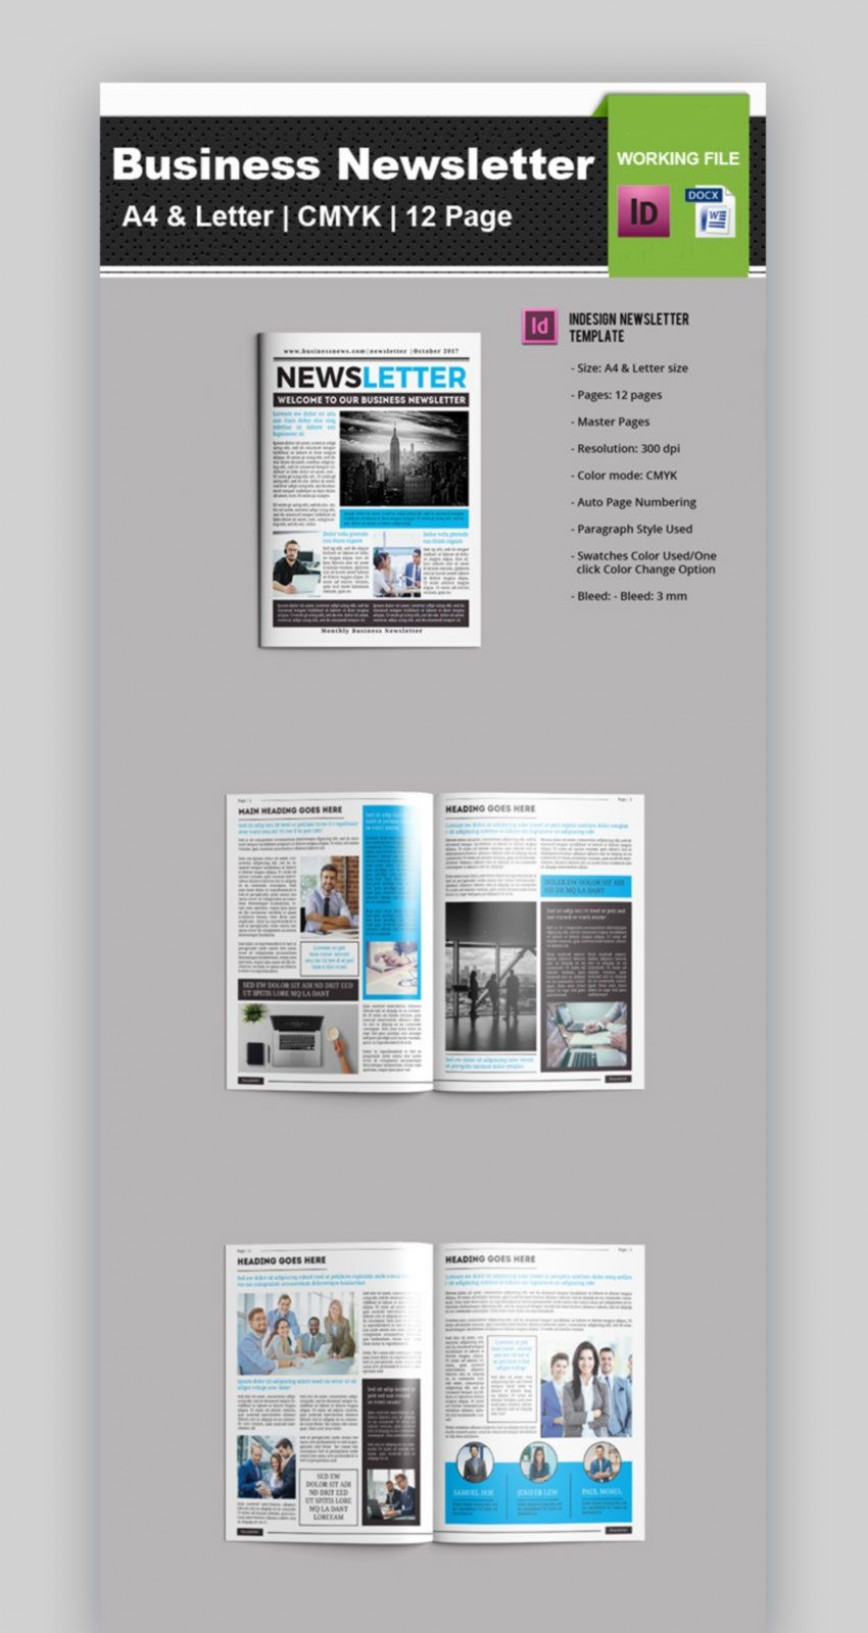 003 Sensational Newsletter Template Microsoft Word Idea  Download Free Employee